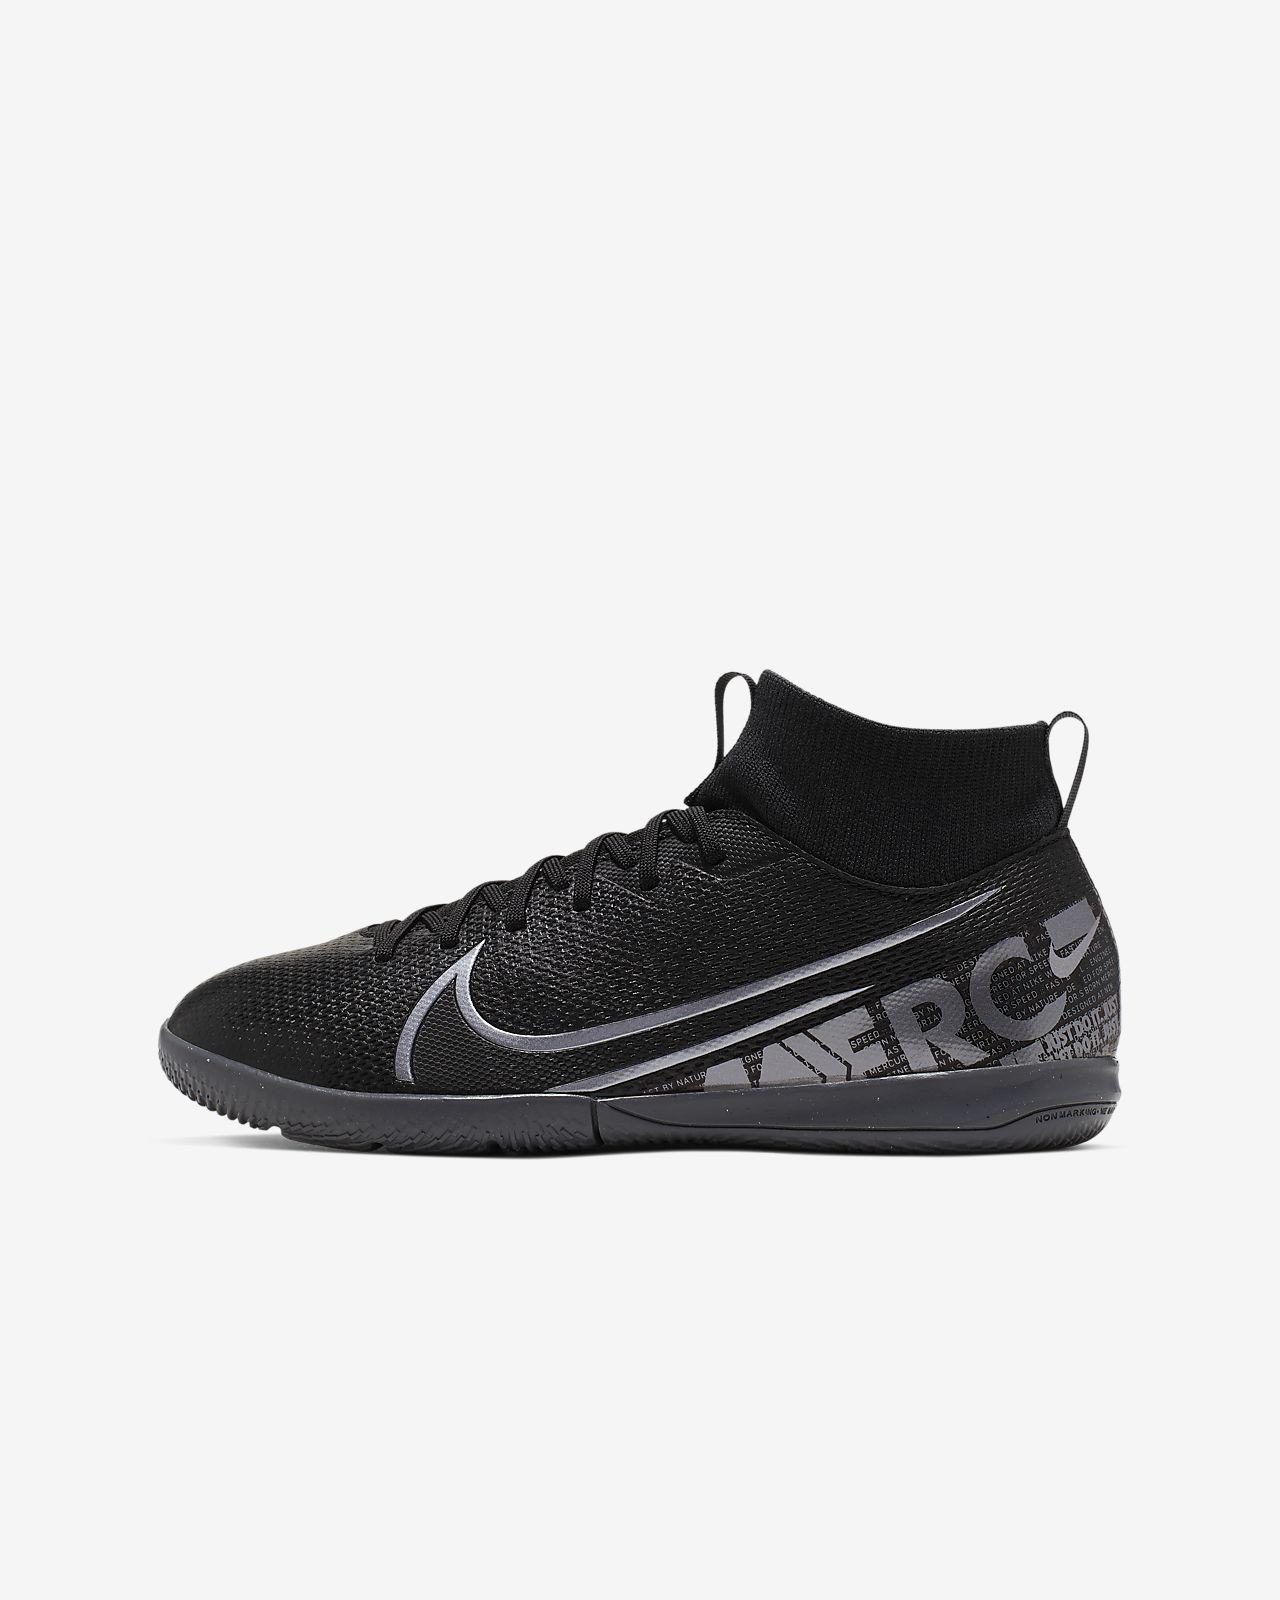 Nike Jr. Mercurial Superfly 7 Academy IC Botas de fútbol sala - Niño/a